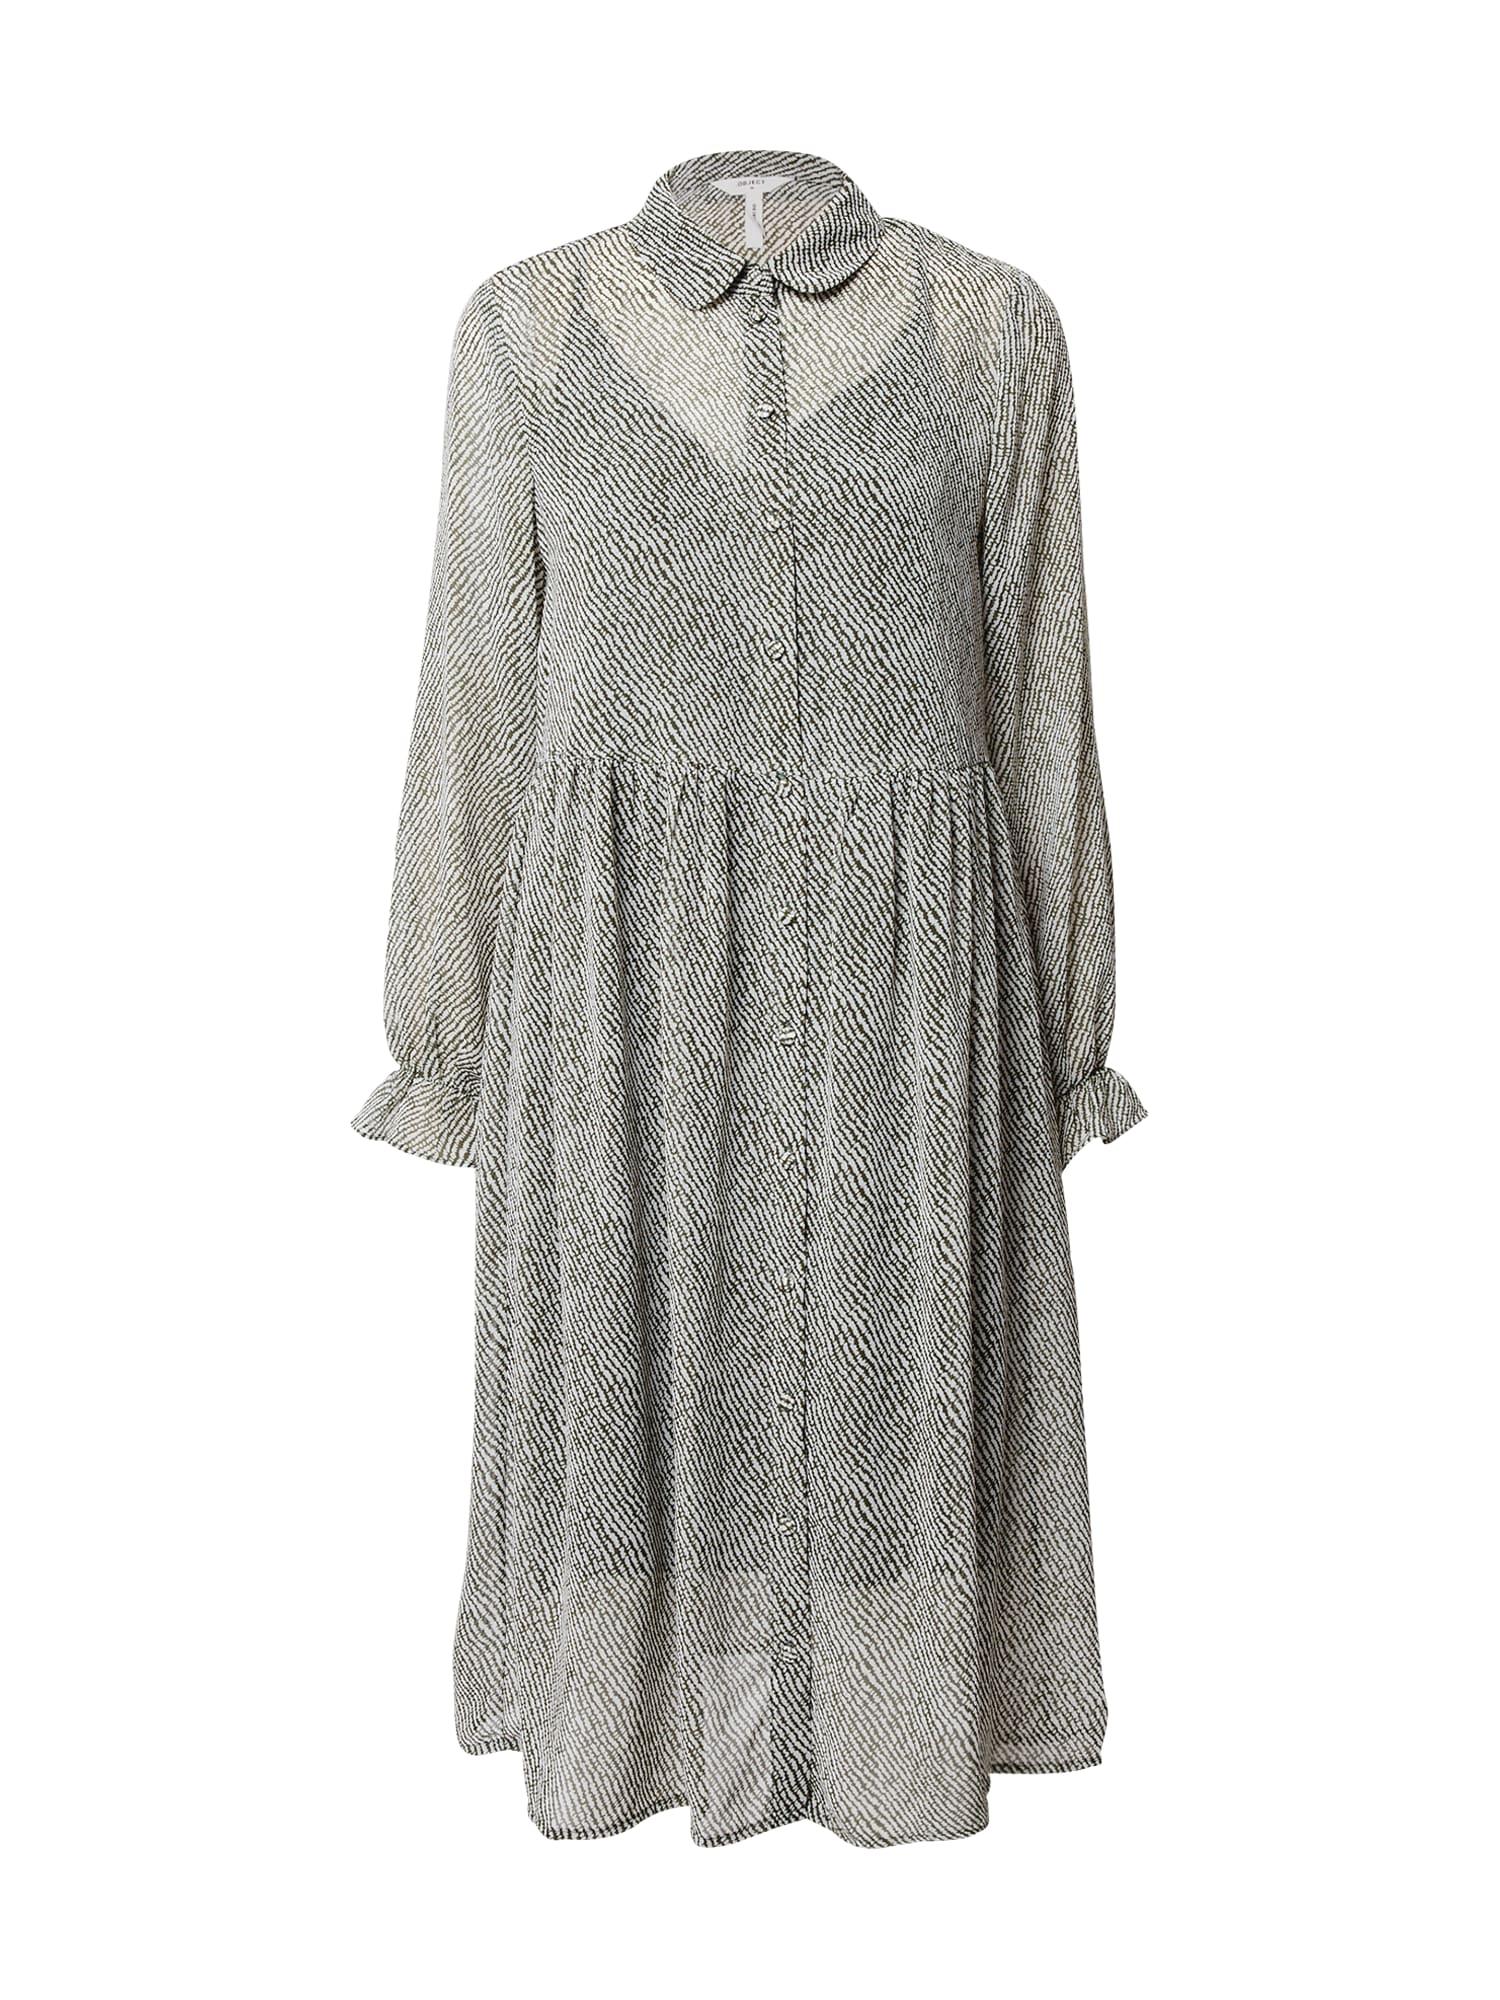 OBJECT Košilové šaty 'Mie'  bílá / černá